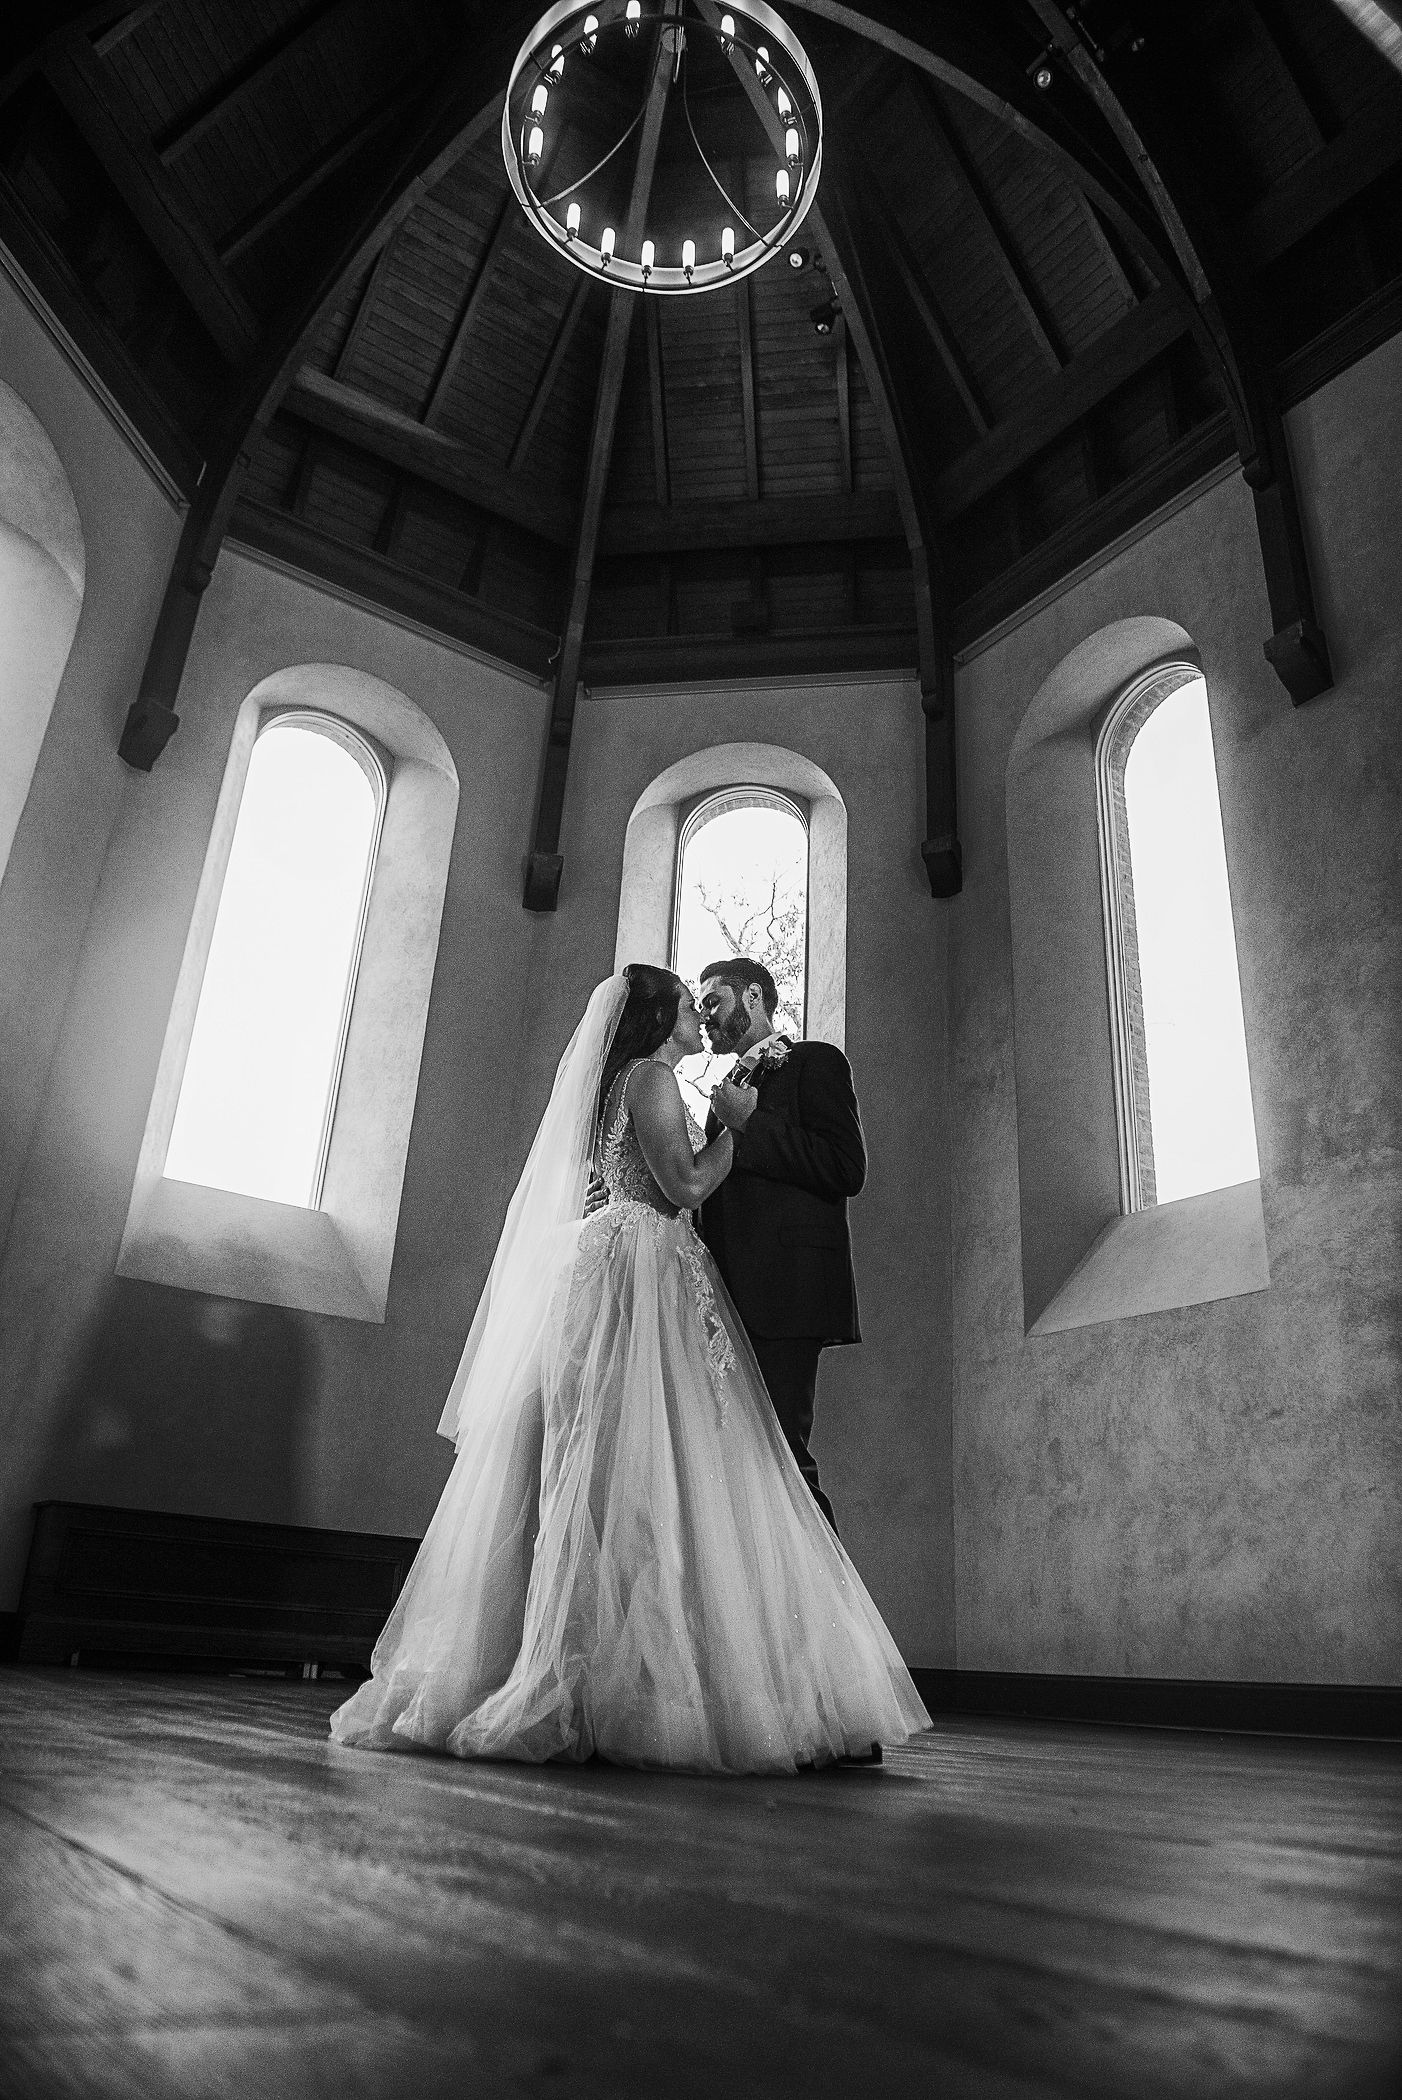 A Covid19 Mini-Wedding Dance In Black and White